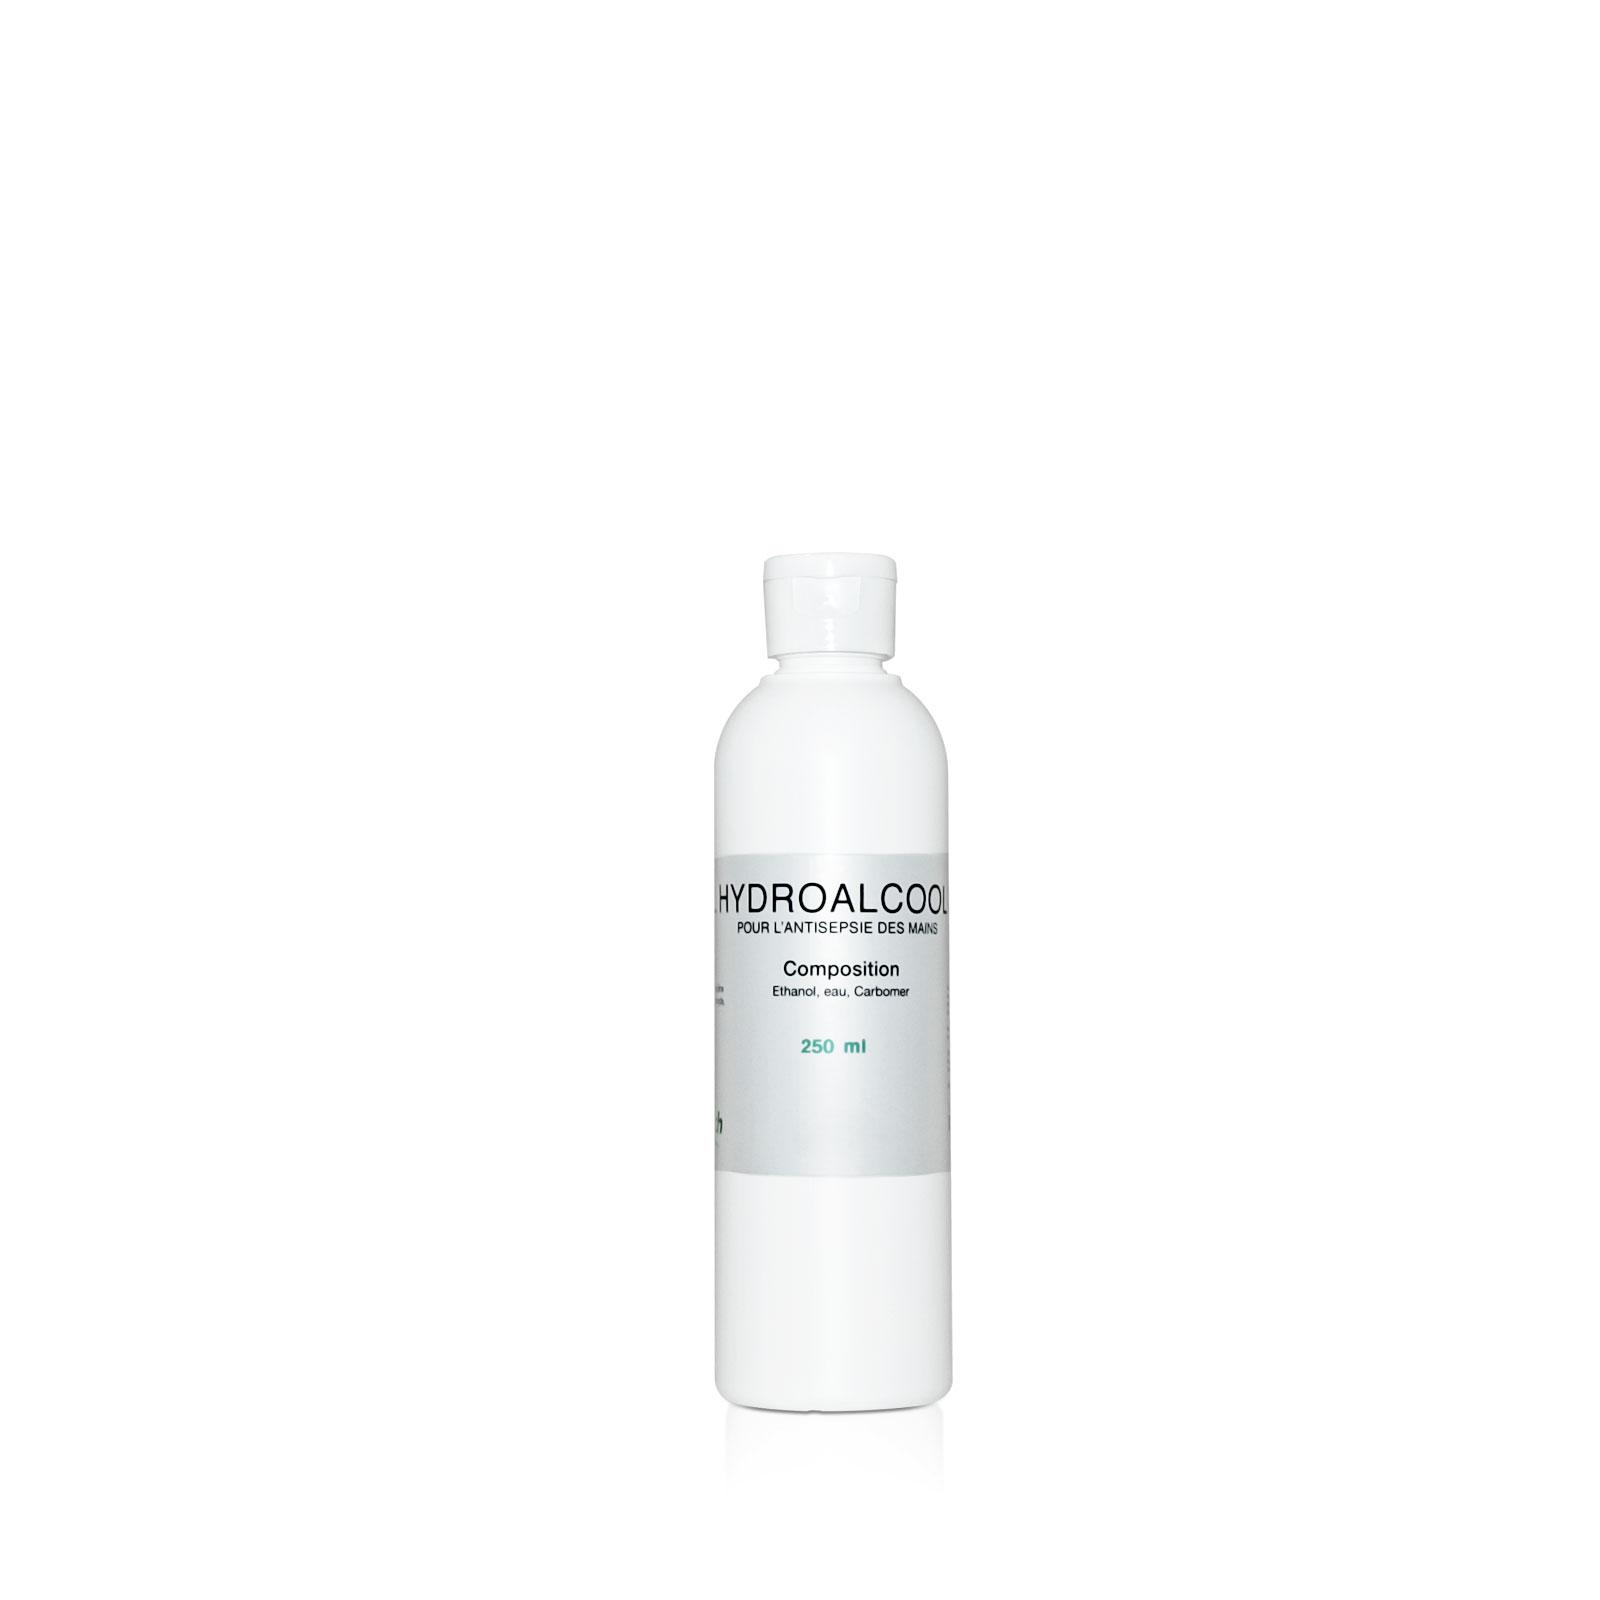 Gel hydroalcoolique 250 mL